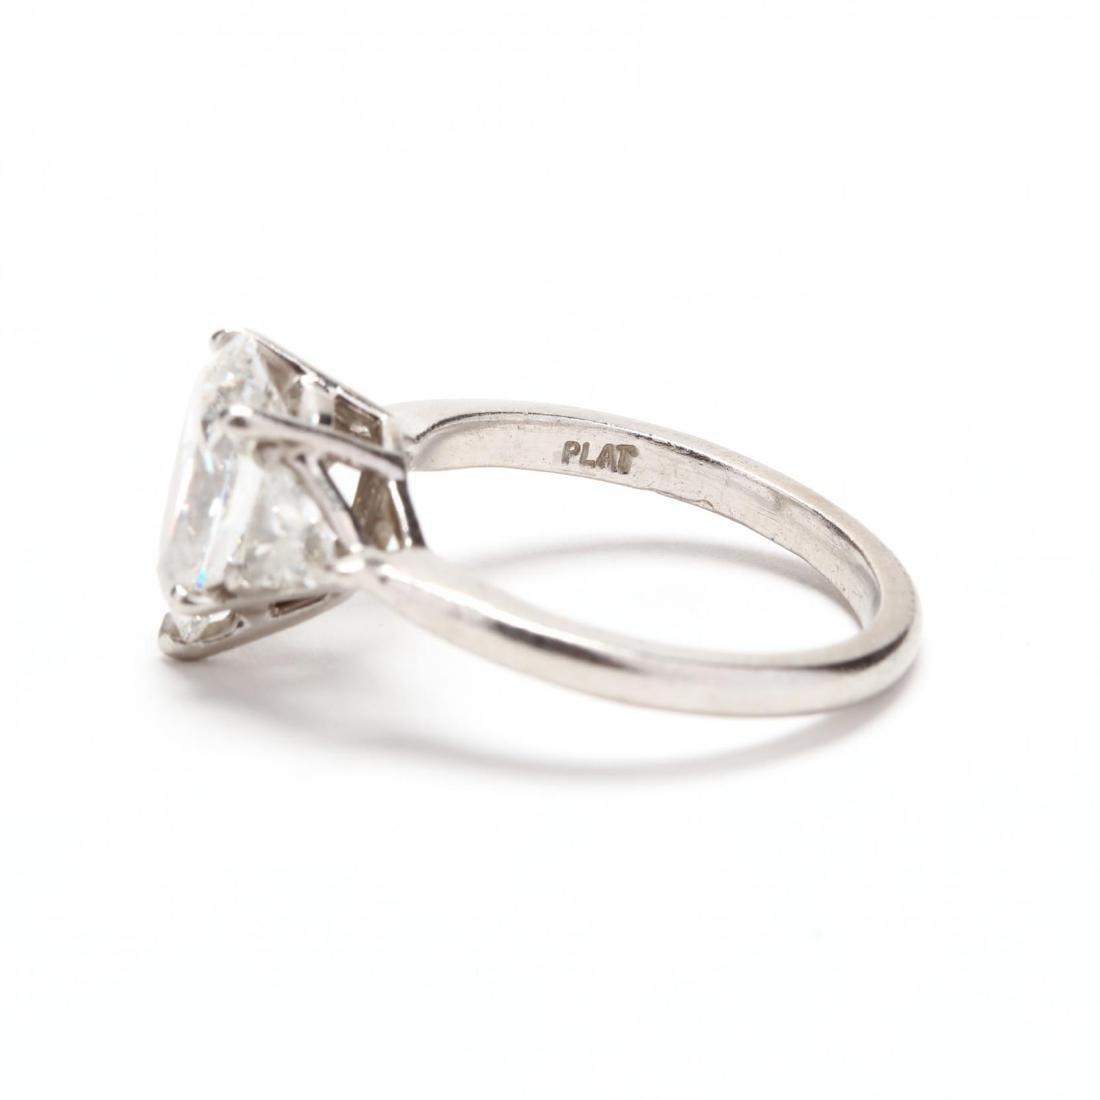 Unmounted Diamond with Platinum and Diamond Mount - 5